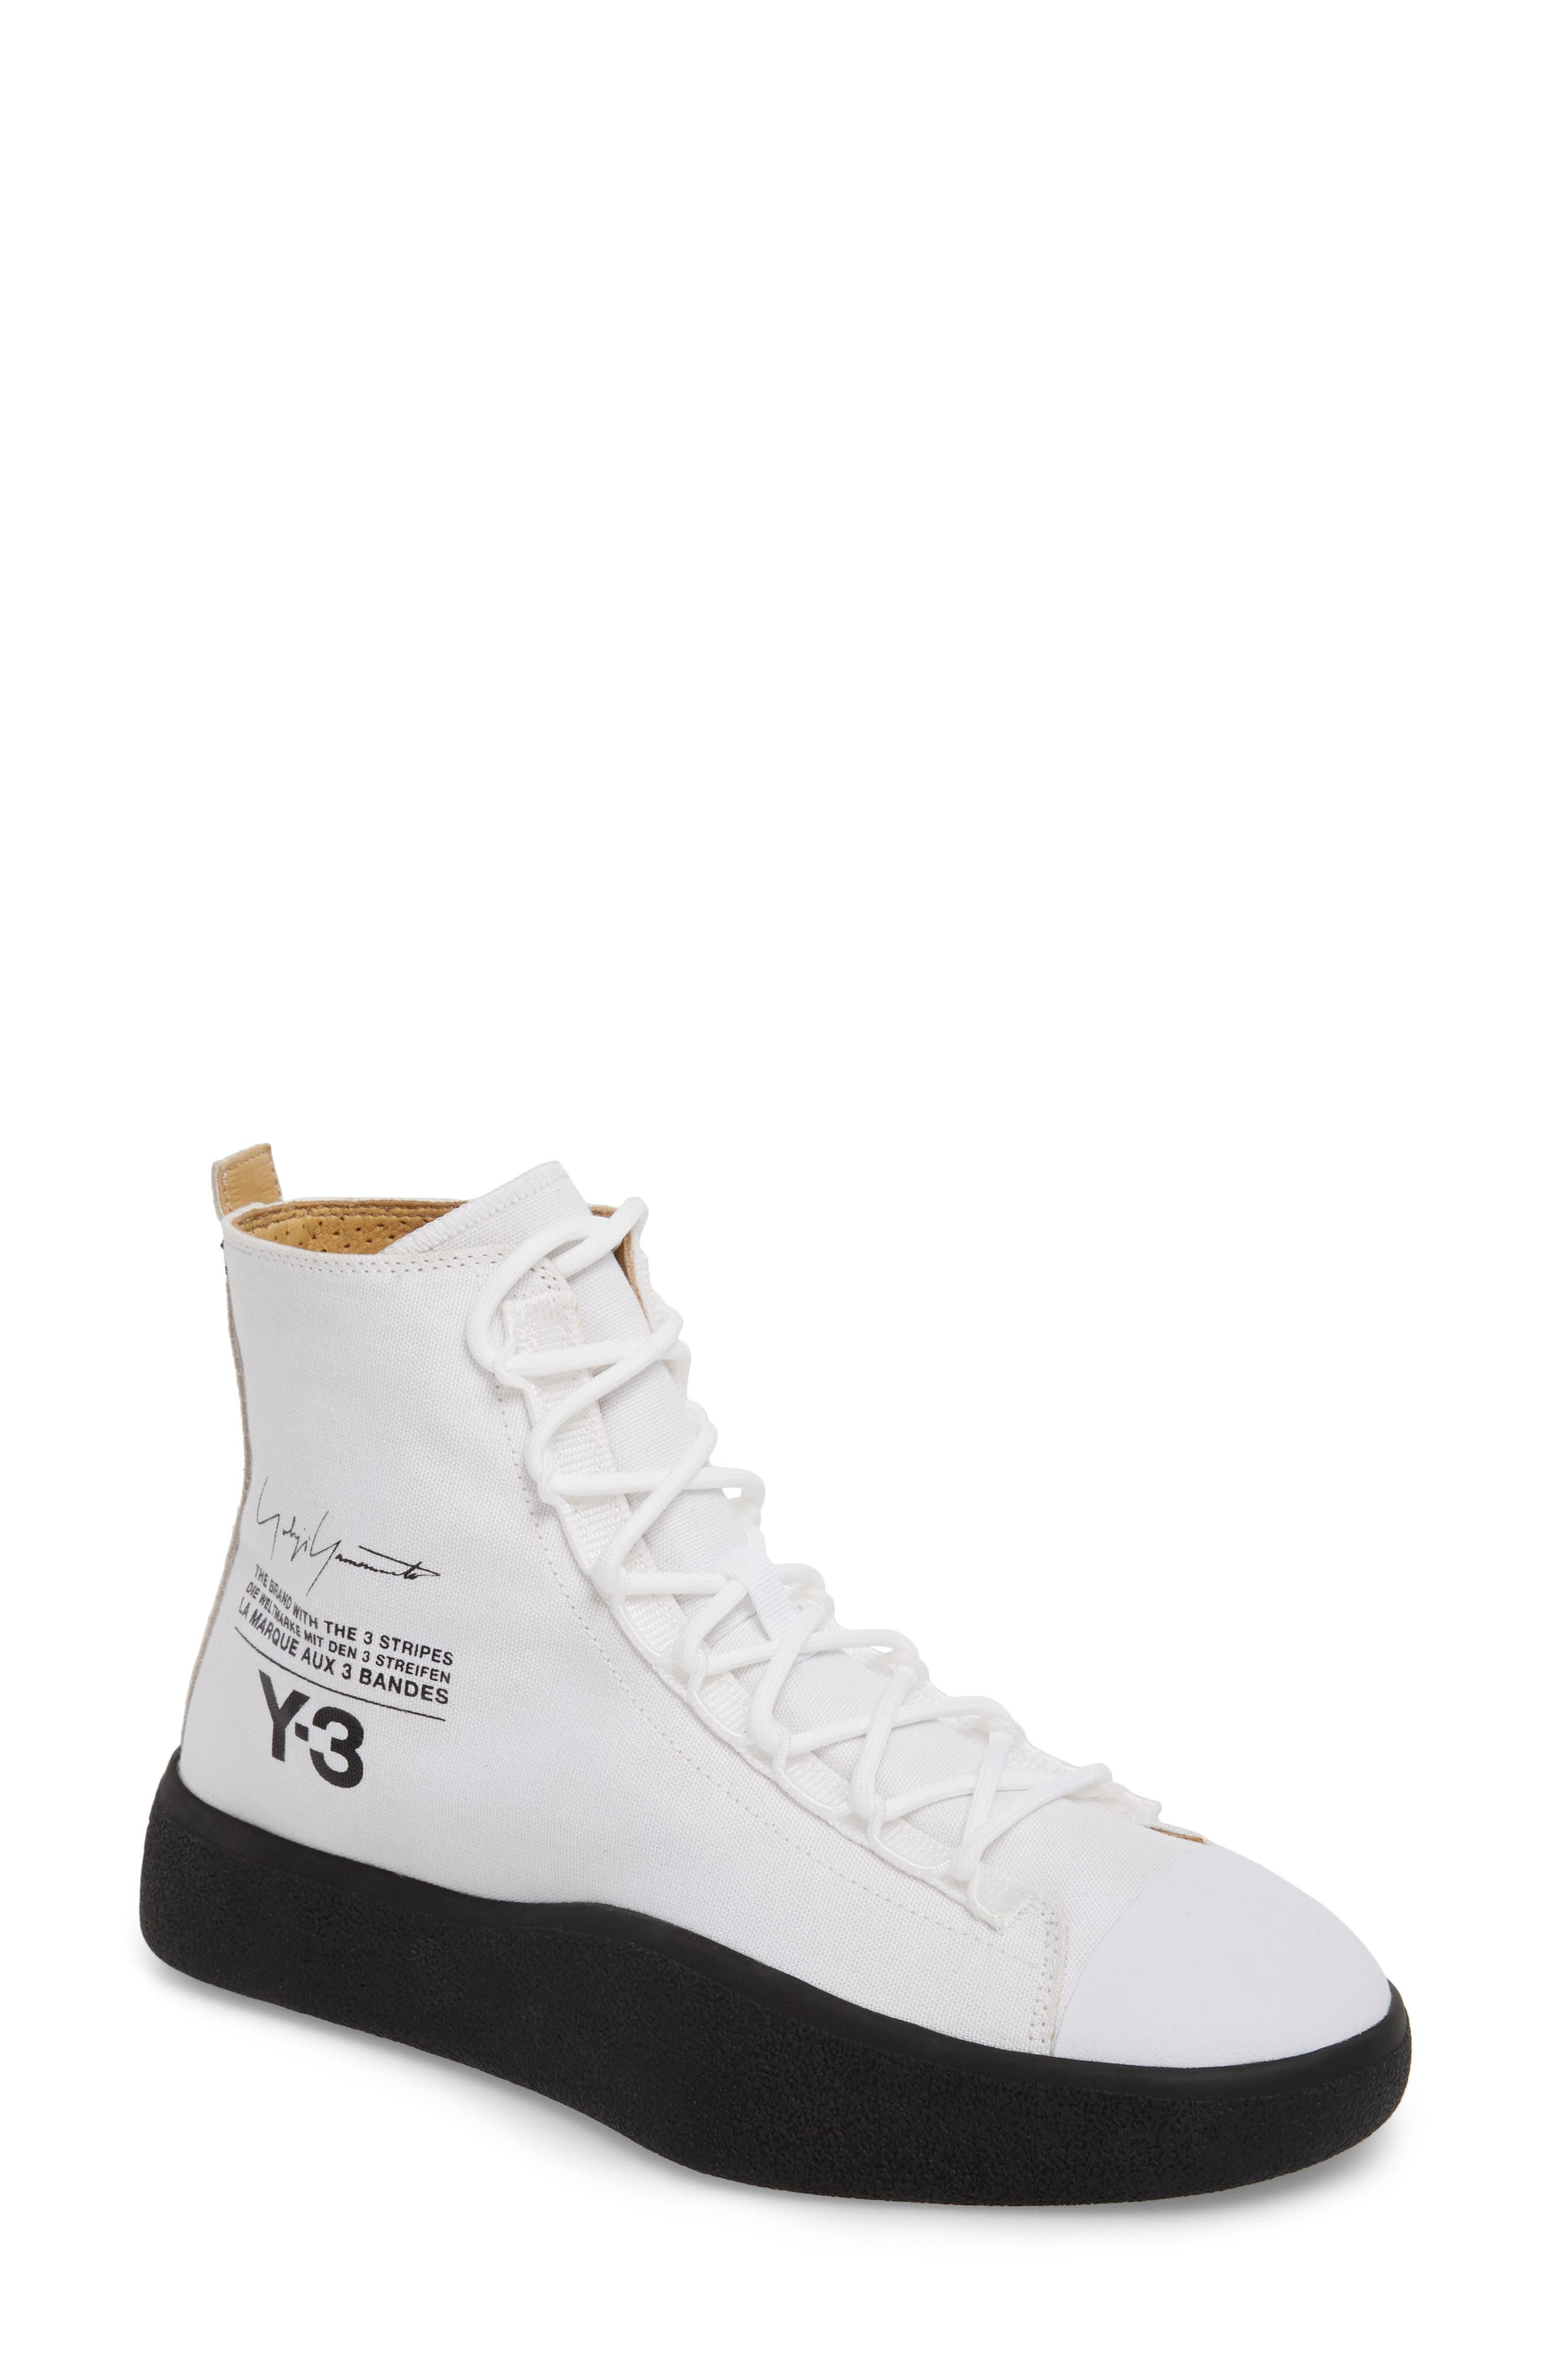 Bashyo High Top Sneaker,                             Main thumbnail 1, color,                             White/ Black